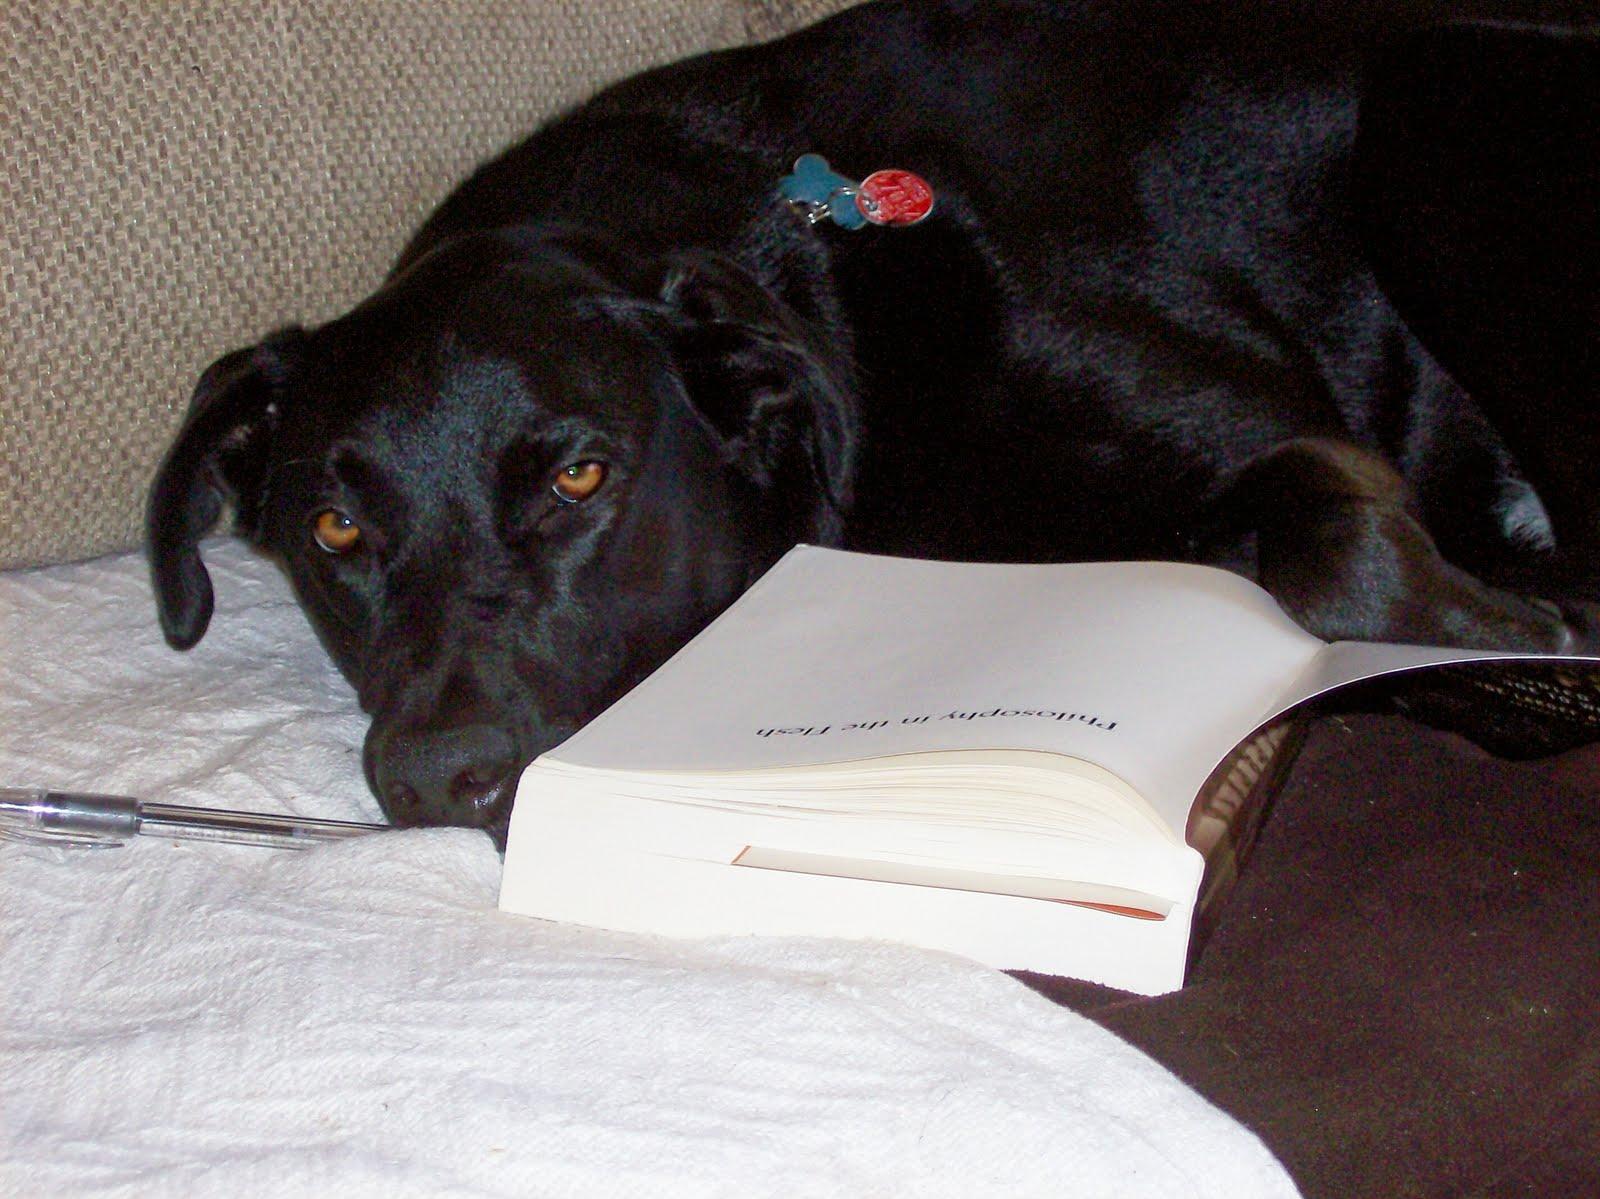 [Wrigley+reading+Lakoff+&+Johnson.jpg]